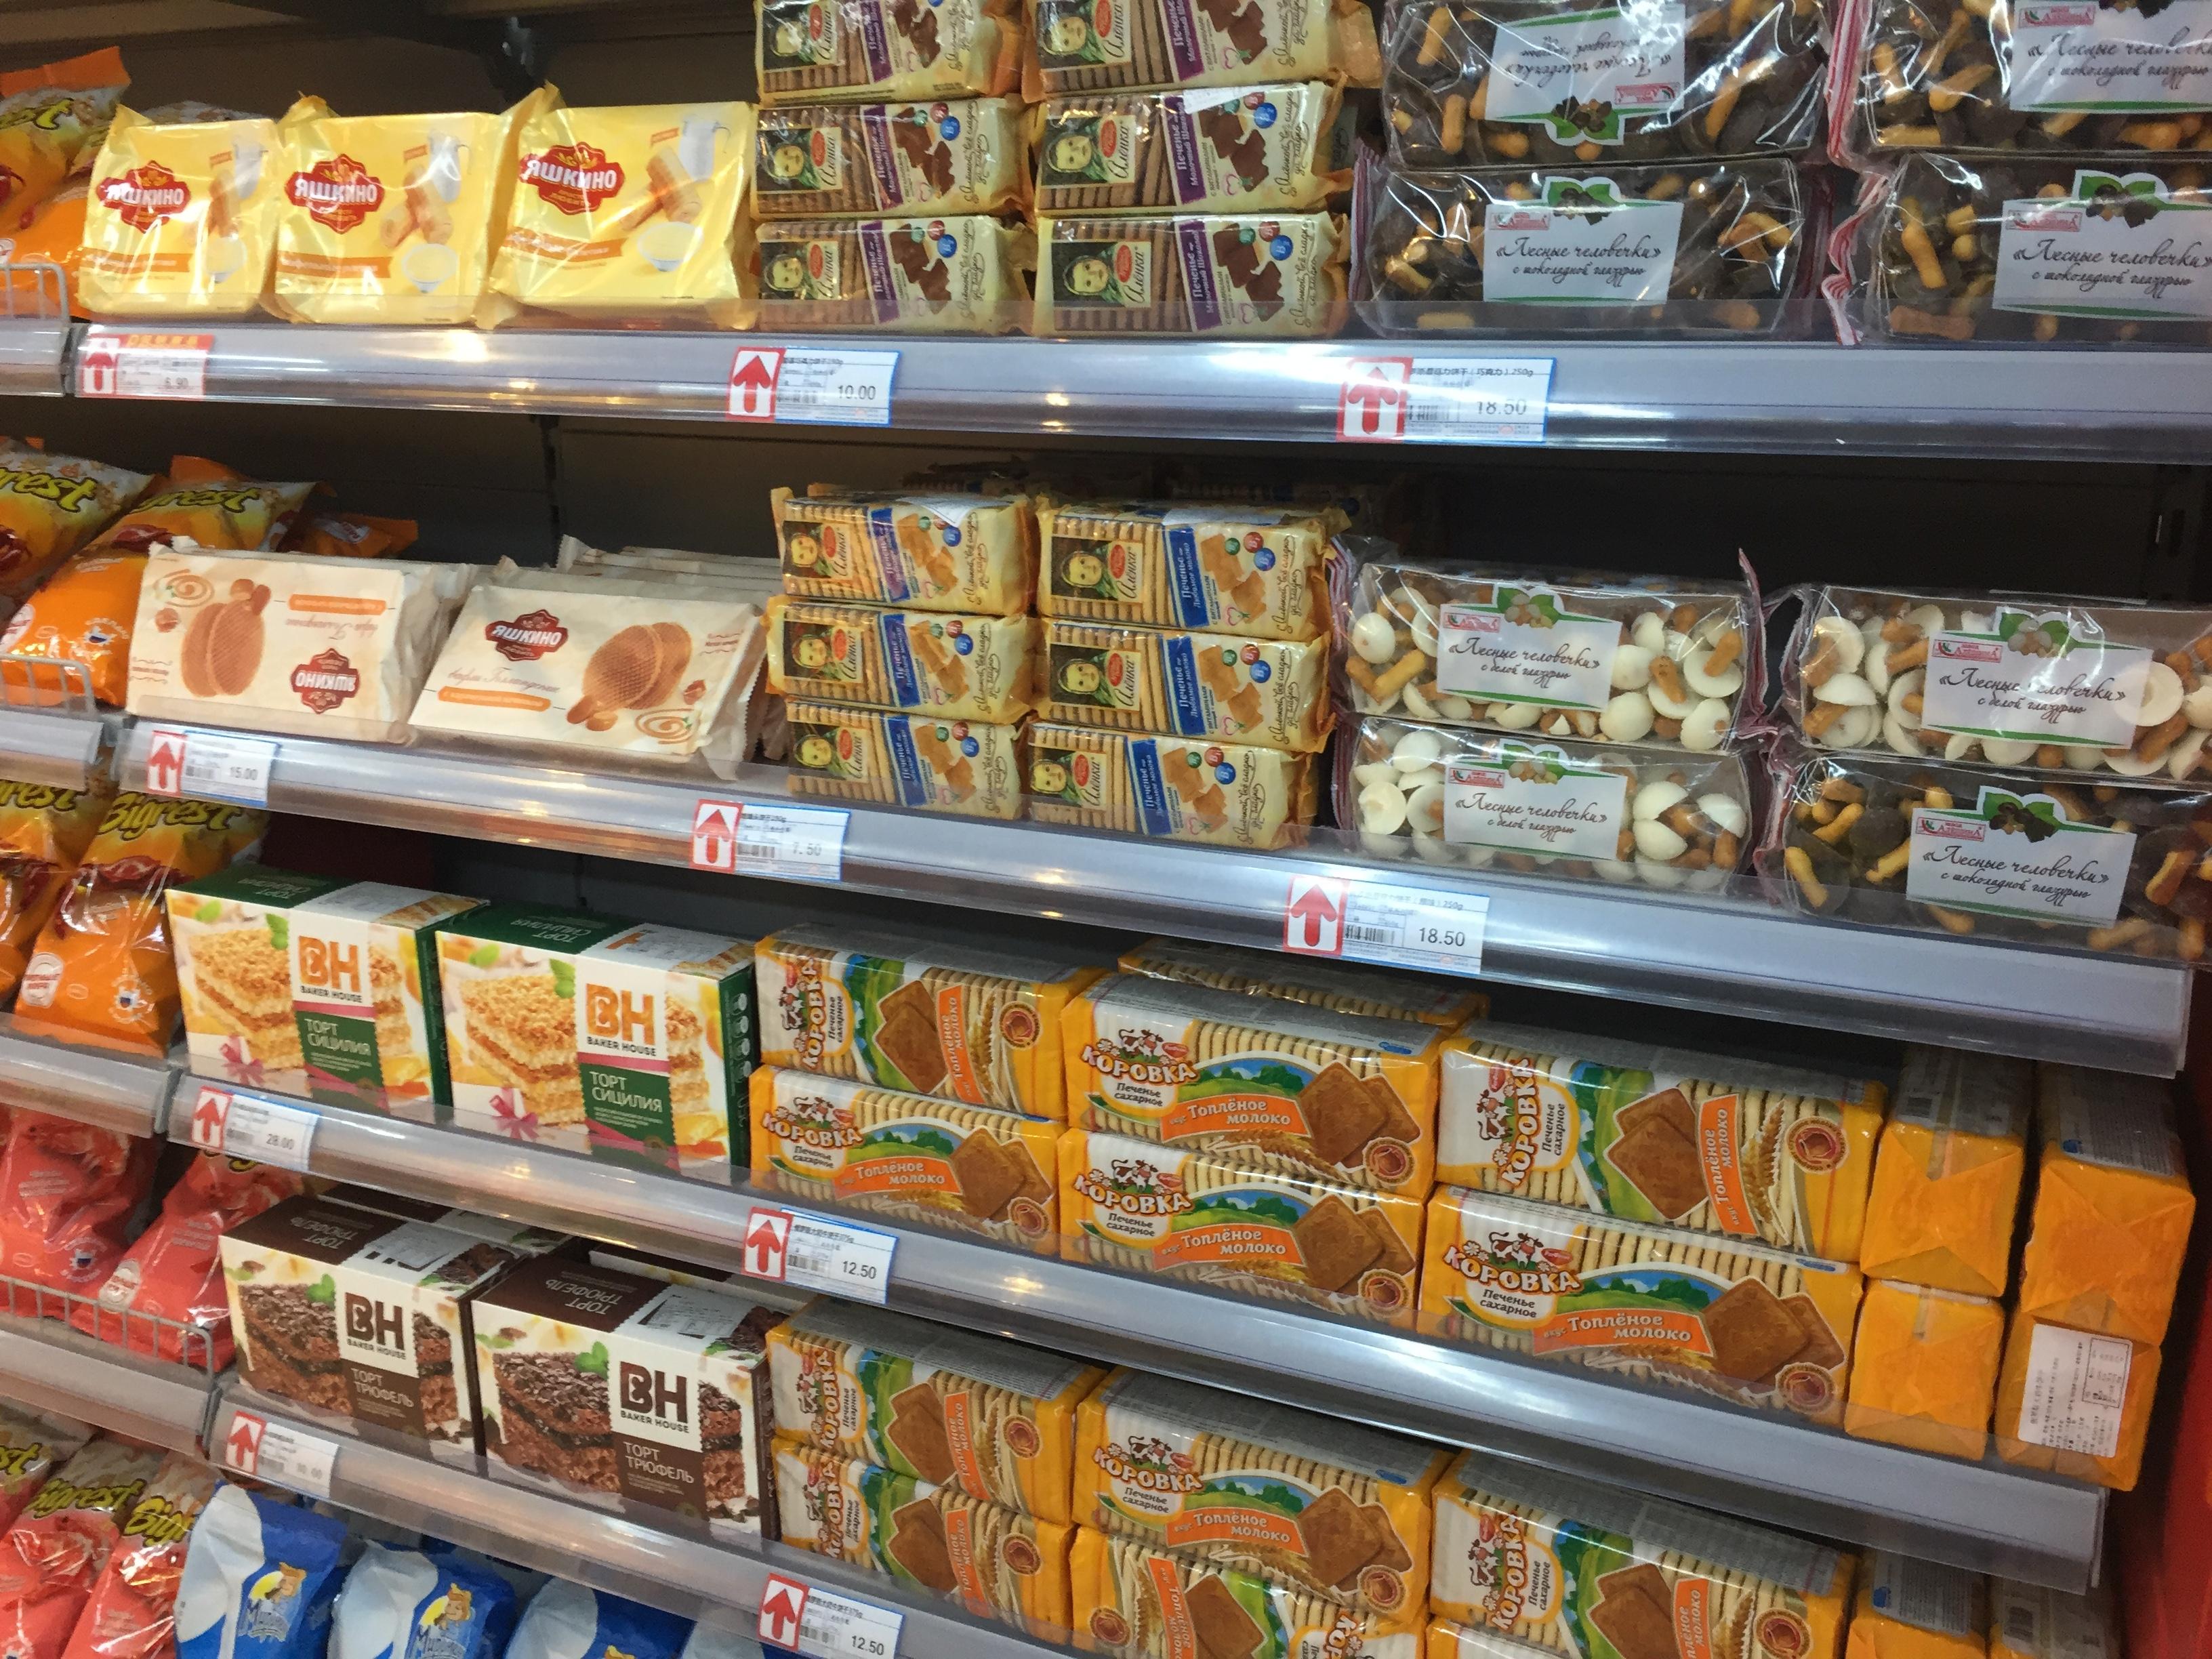 Ассортимент супермаркета приятно удивил